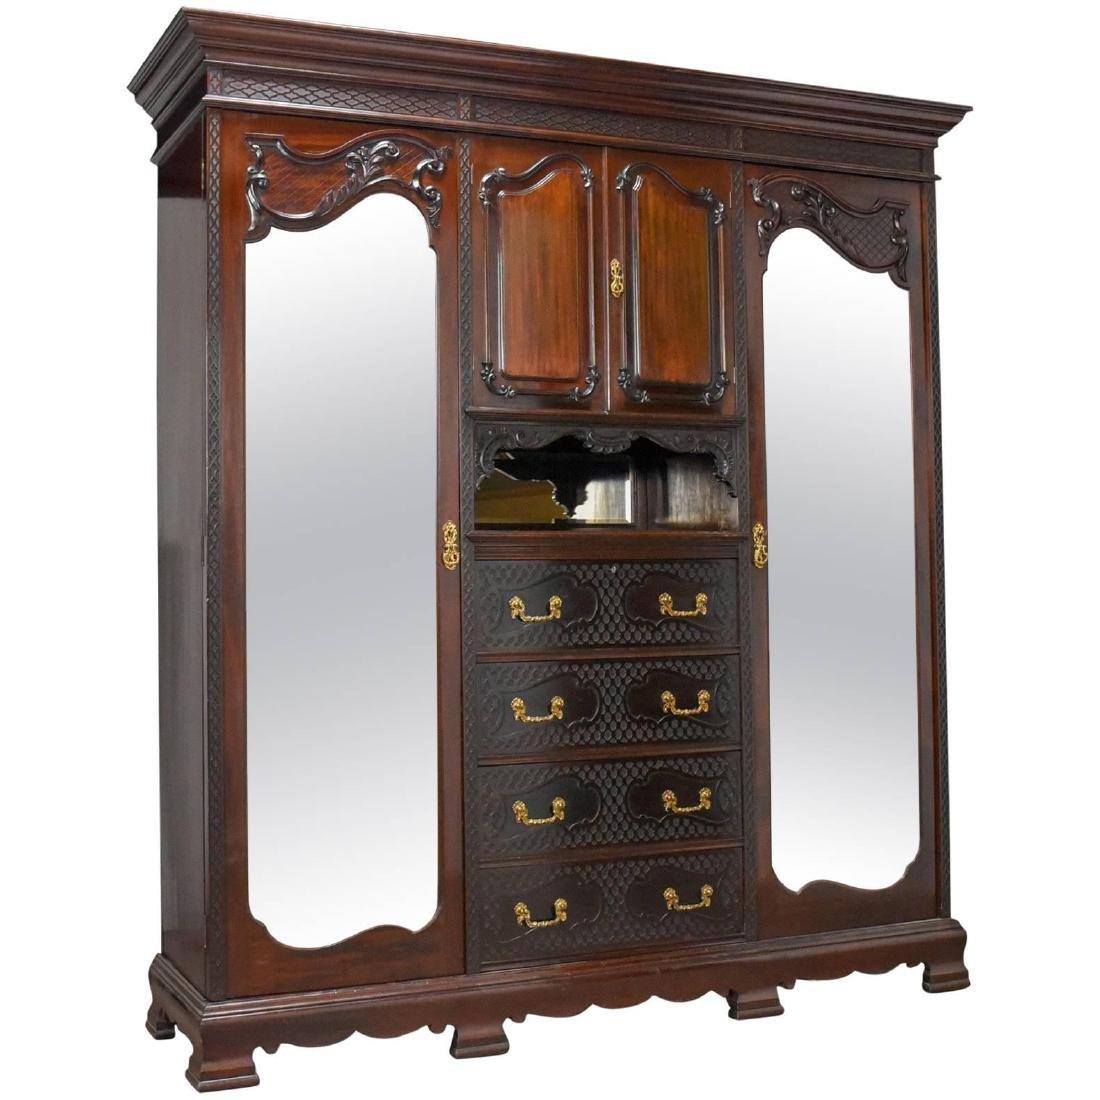 Antique Wardrobe, Carved Mahogany, English, Compactum,